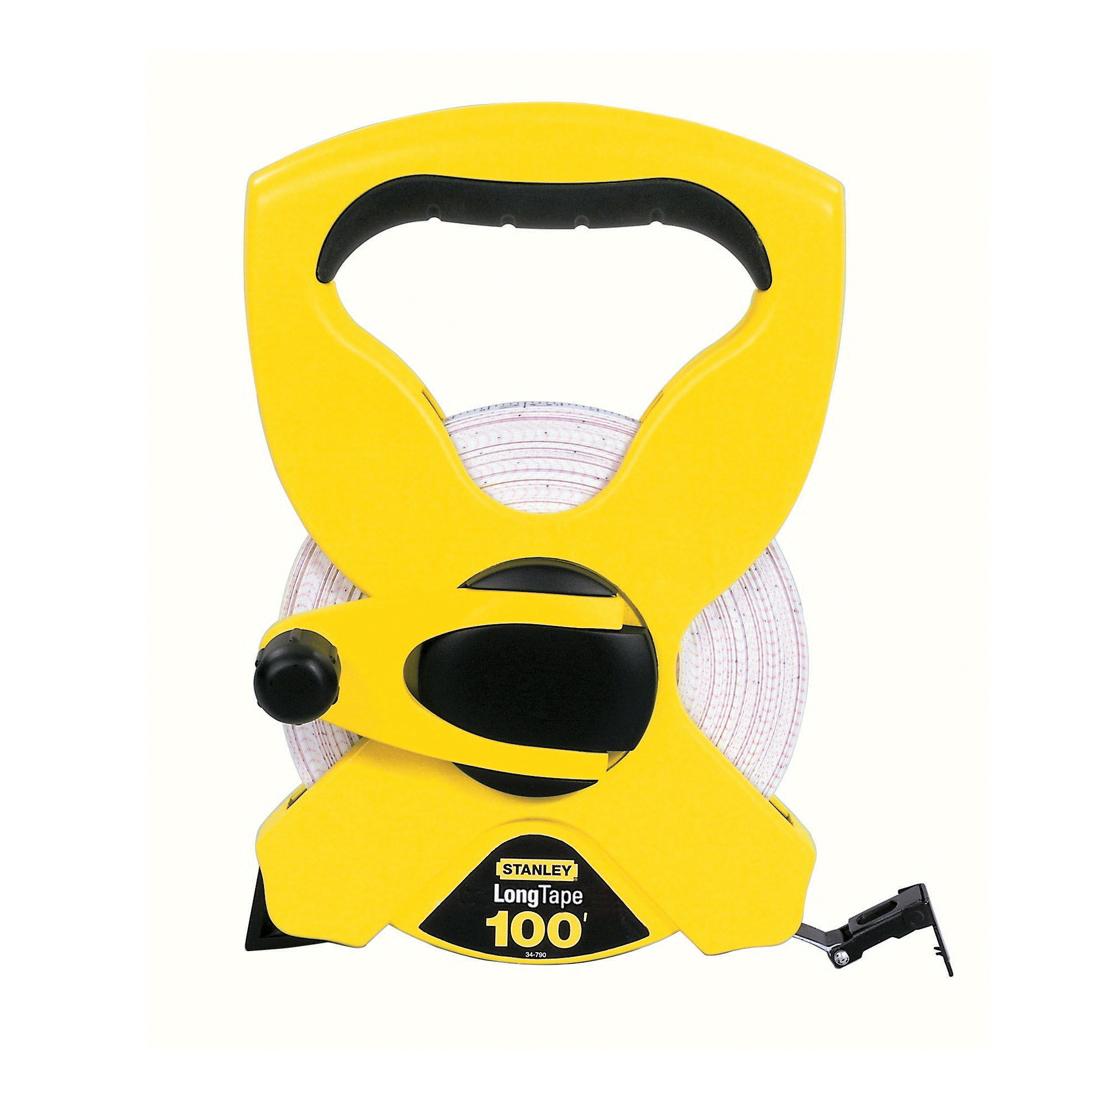 Stanley® Contractor Grade™ 34-790 Long Open Reel Tape Rule, 100 ft L x 1/2 in W Blade, Polymer Coated Fiberglass, Imperial